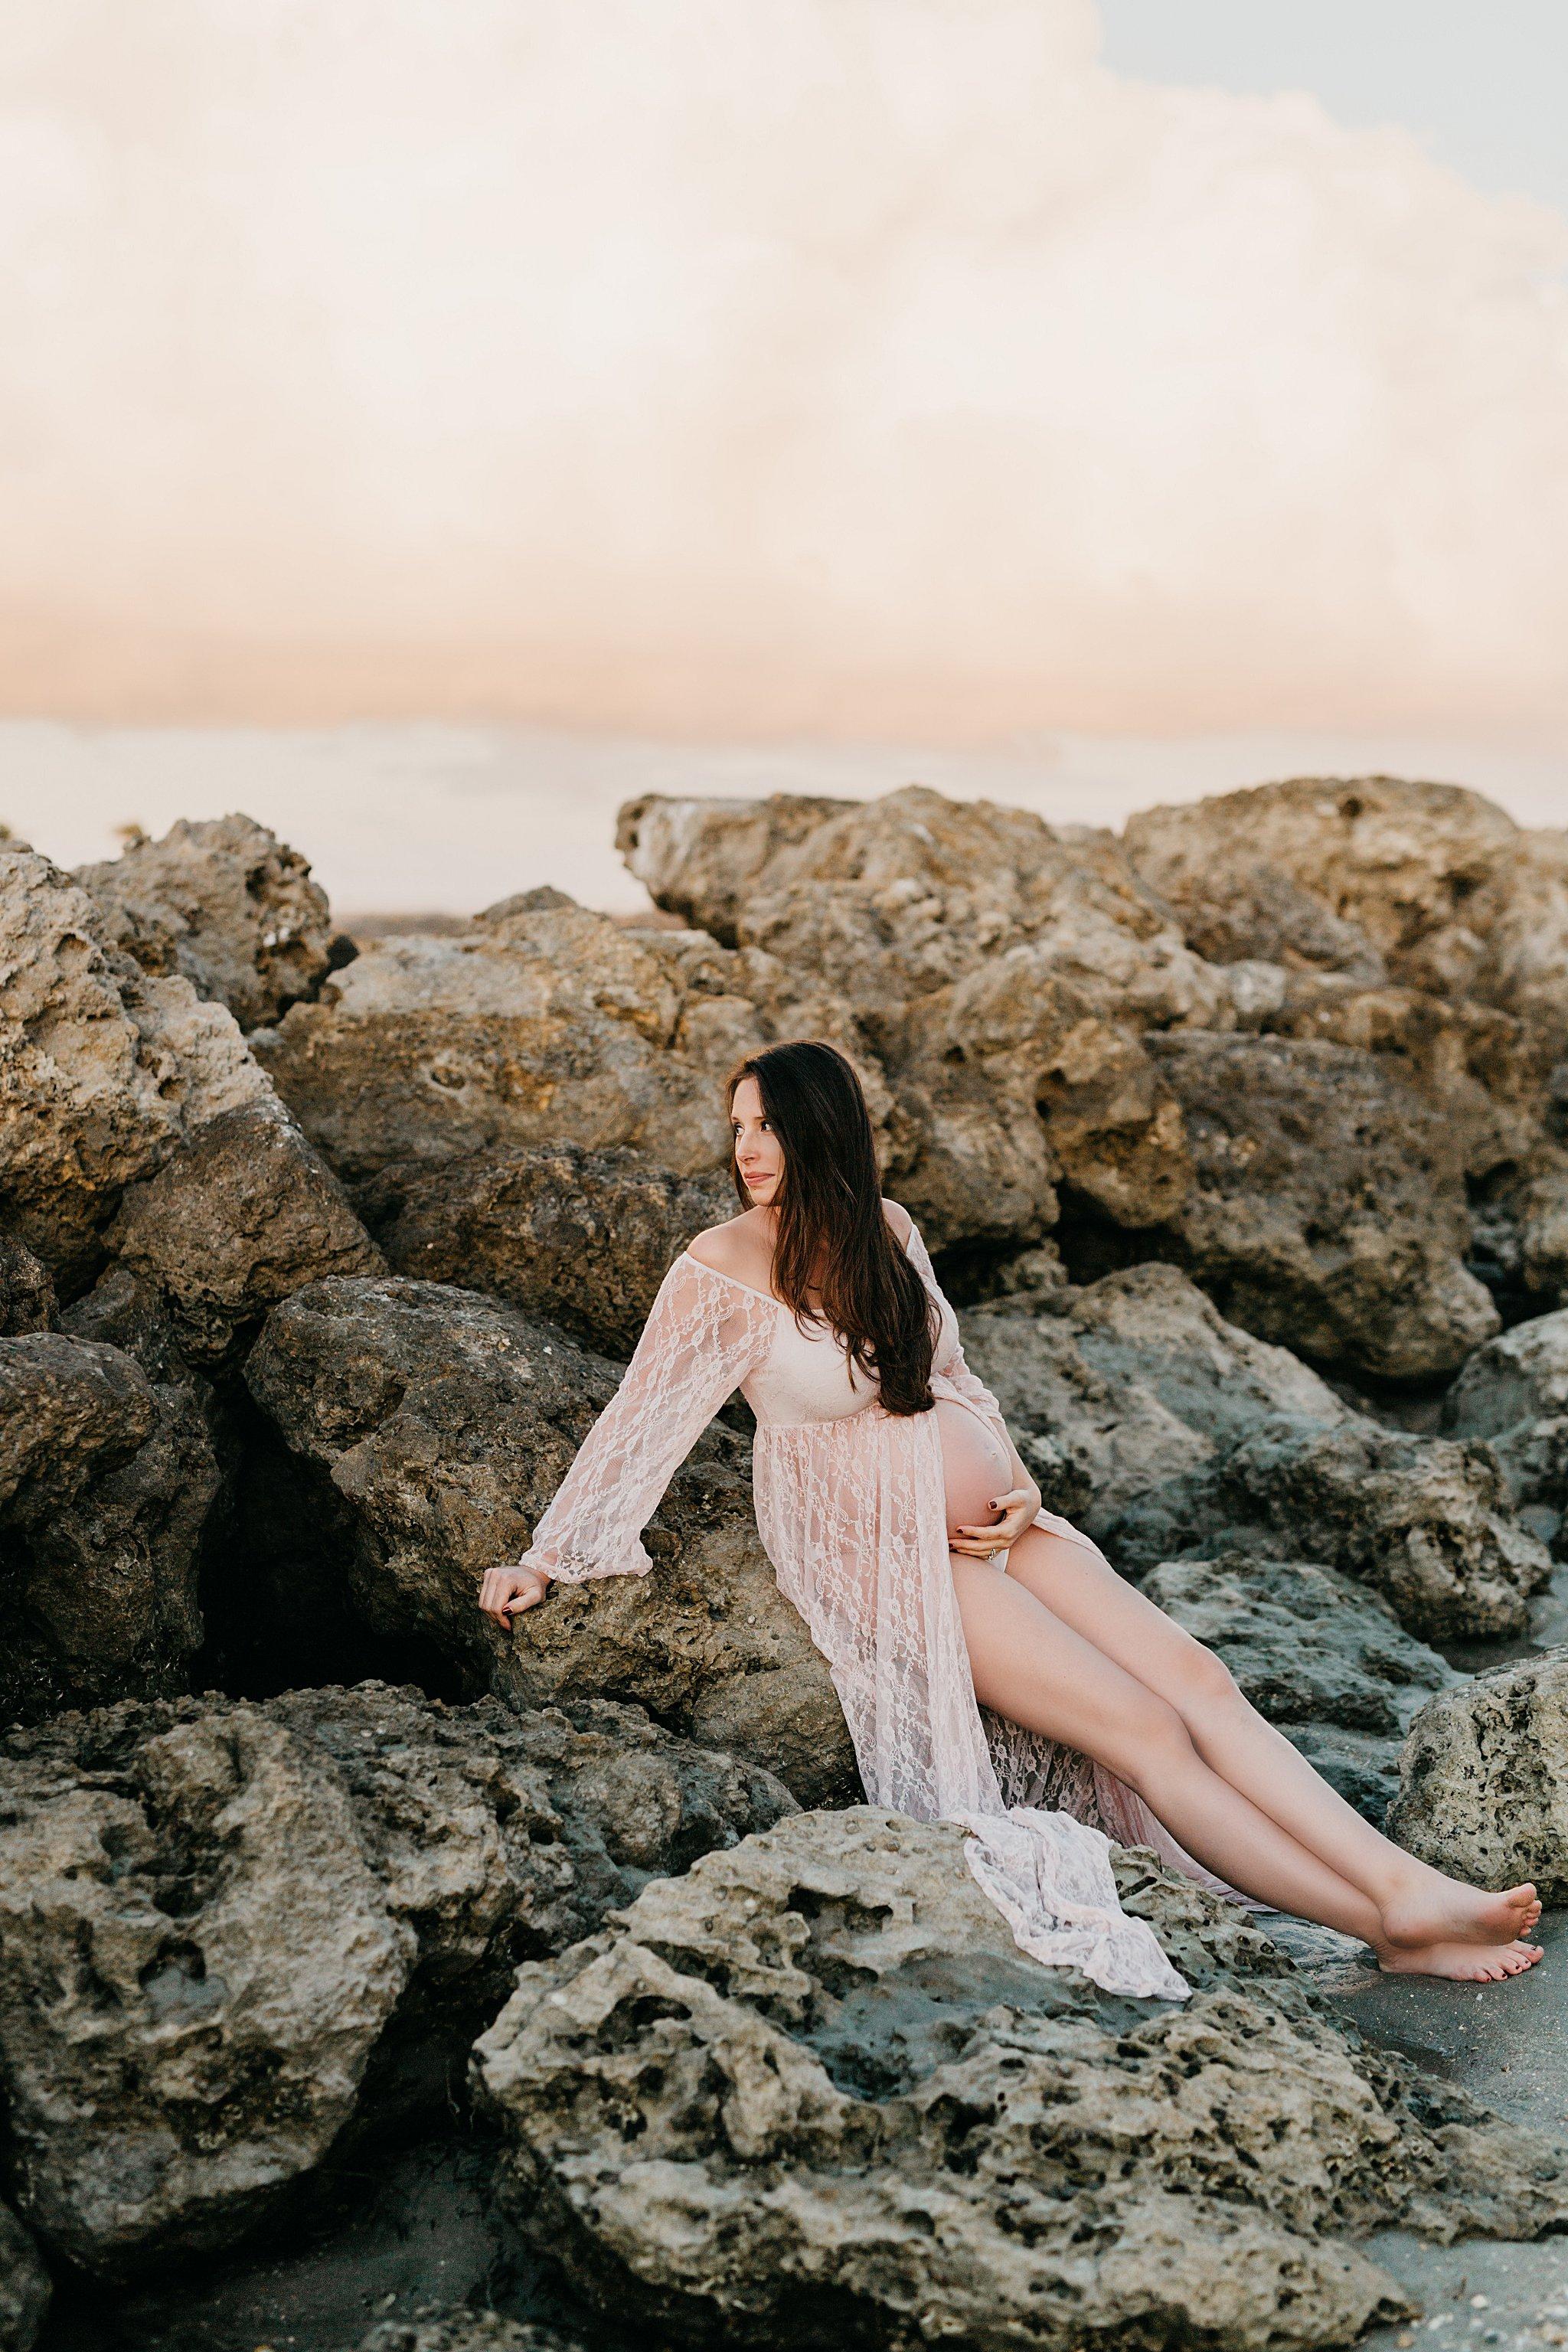 JessicaBordnerPhotography_4597.jpg